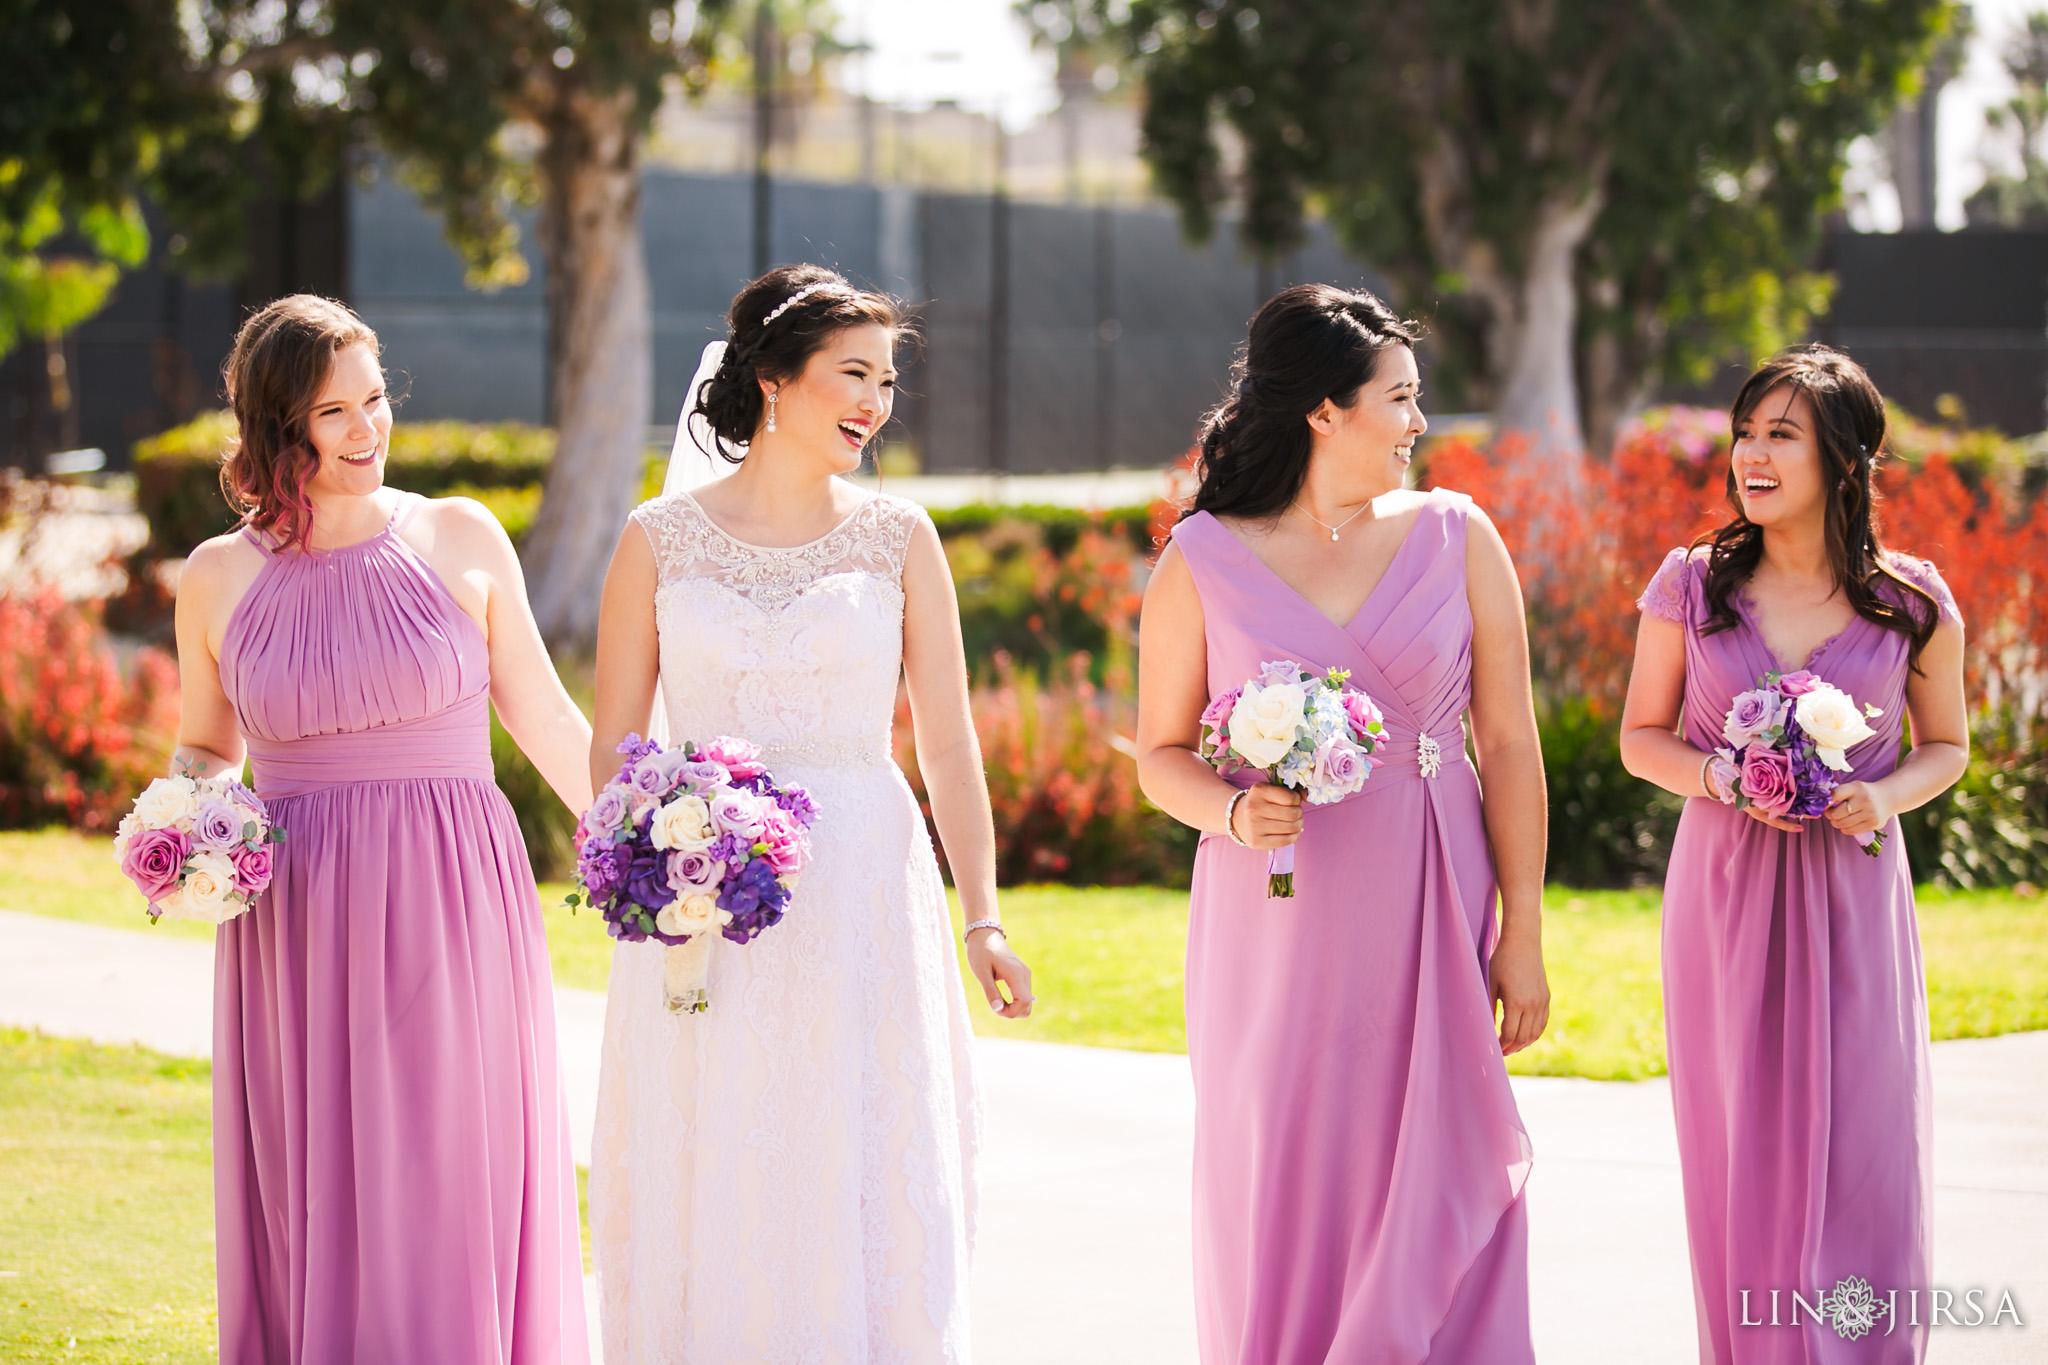 04 seacliff country club huntington beach bridesmaids wedding photography